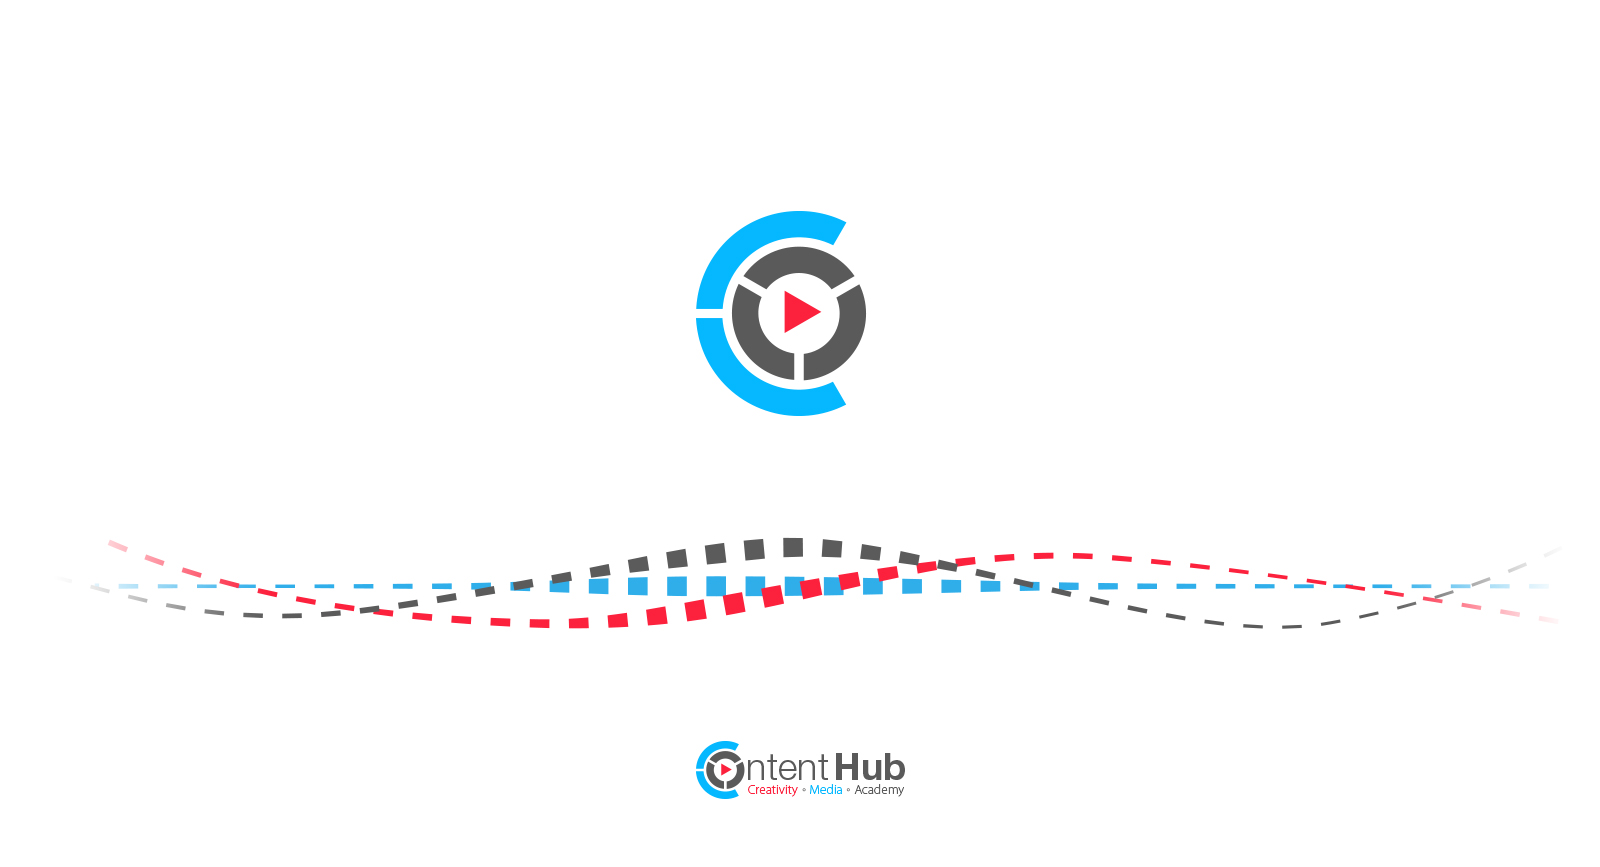 Logo amd brand content hub Herzeliya מיתוג ולוגו חממת התוכן הבינתחומי הרצליה